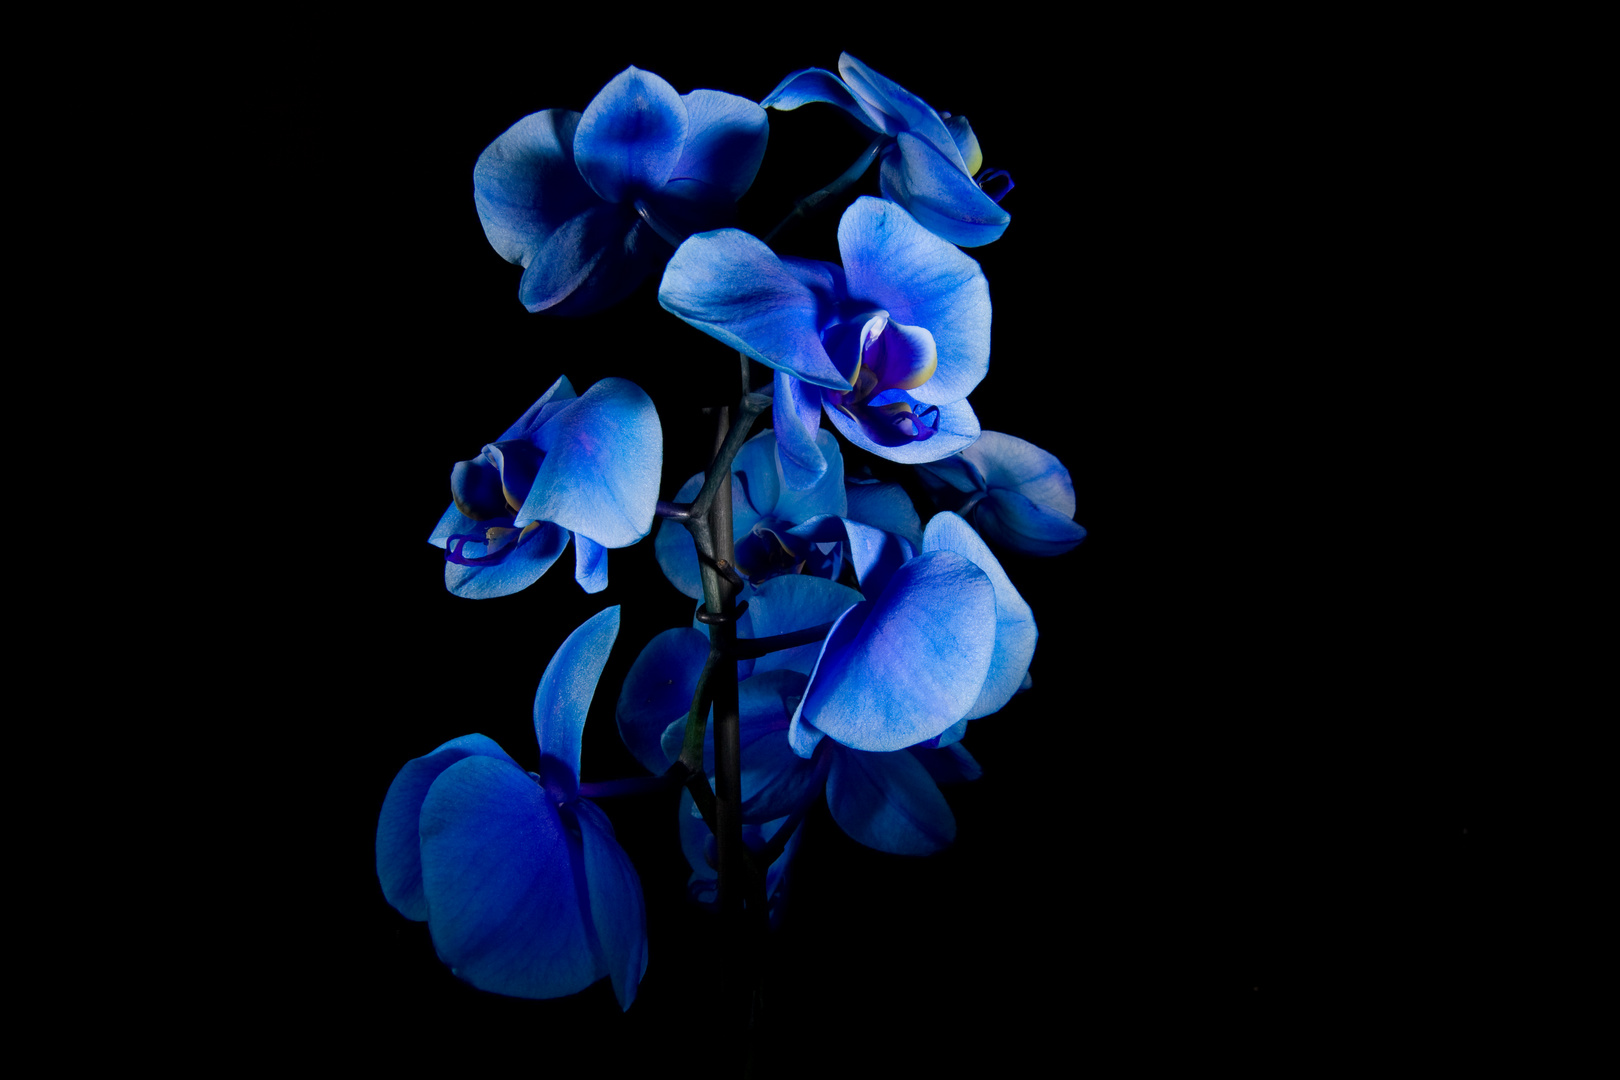 blaue blume foto bild pflanzen pilze flechten bl ten kleinpflanzen orchideen bilder. Black Bedroom Furniture Sets. Home Design Ideas